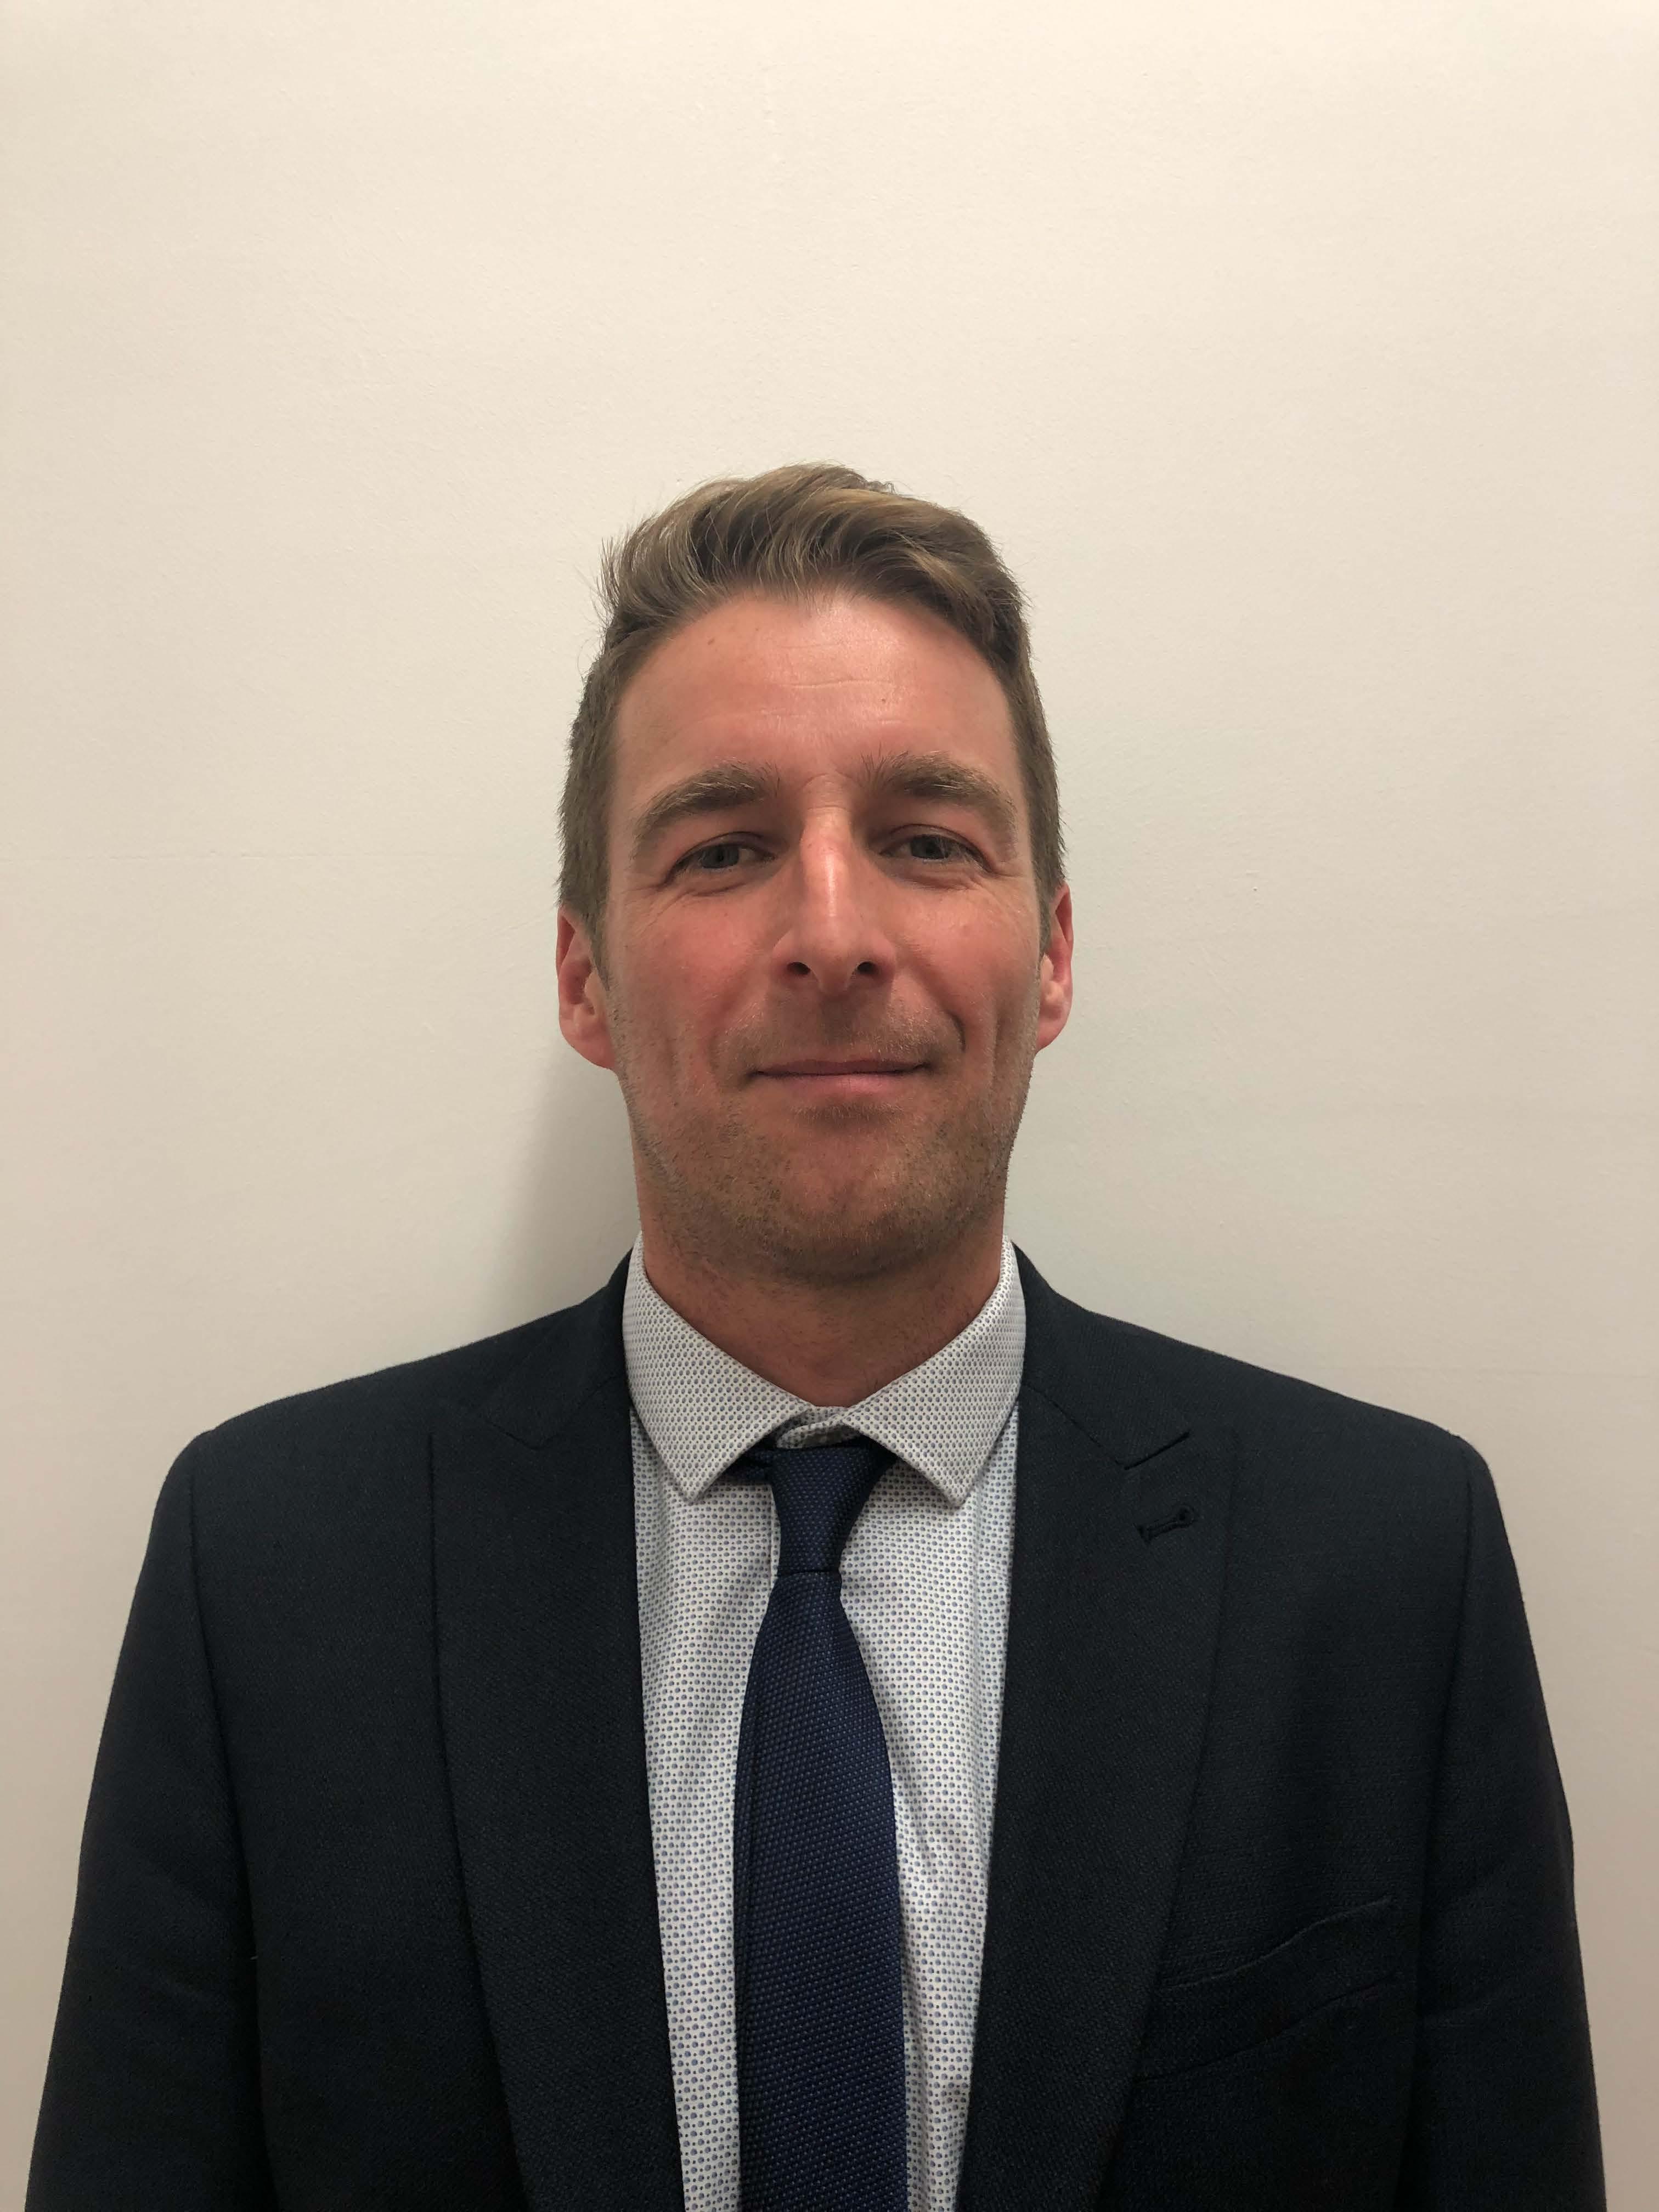 Profile image of Mr M Salthouse